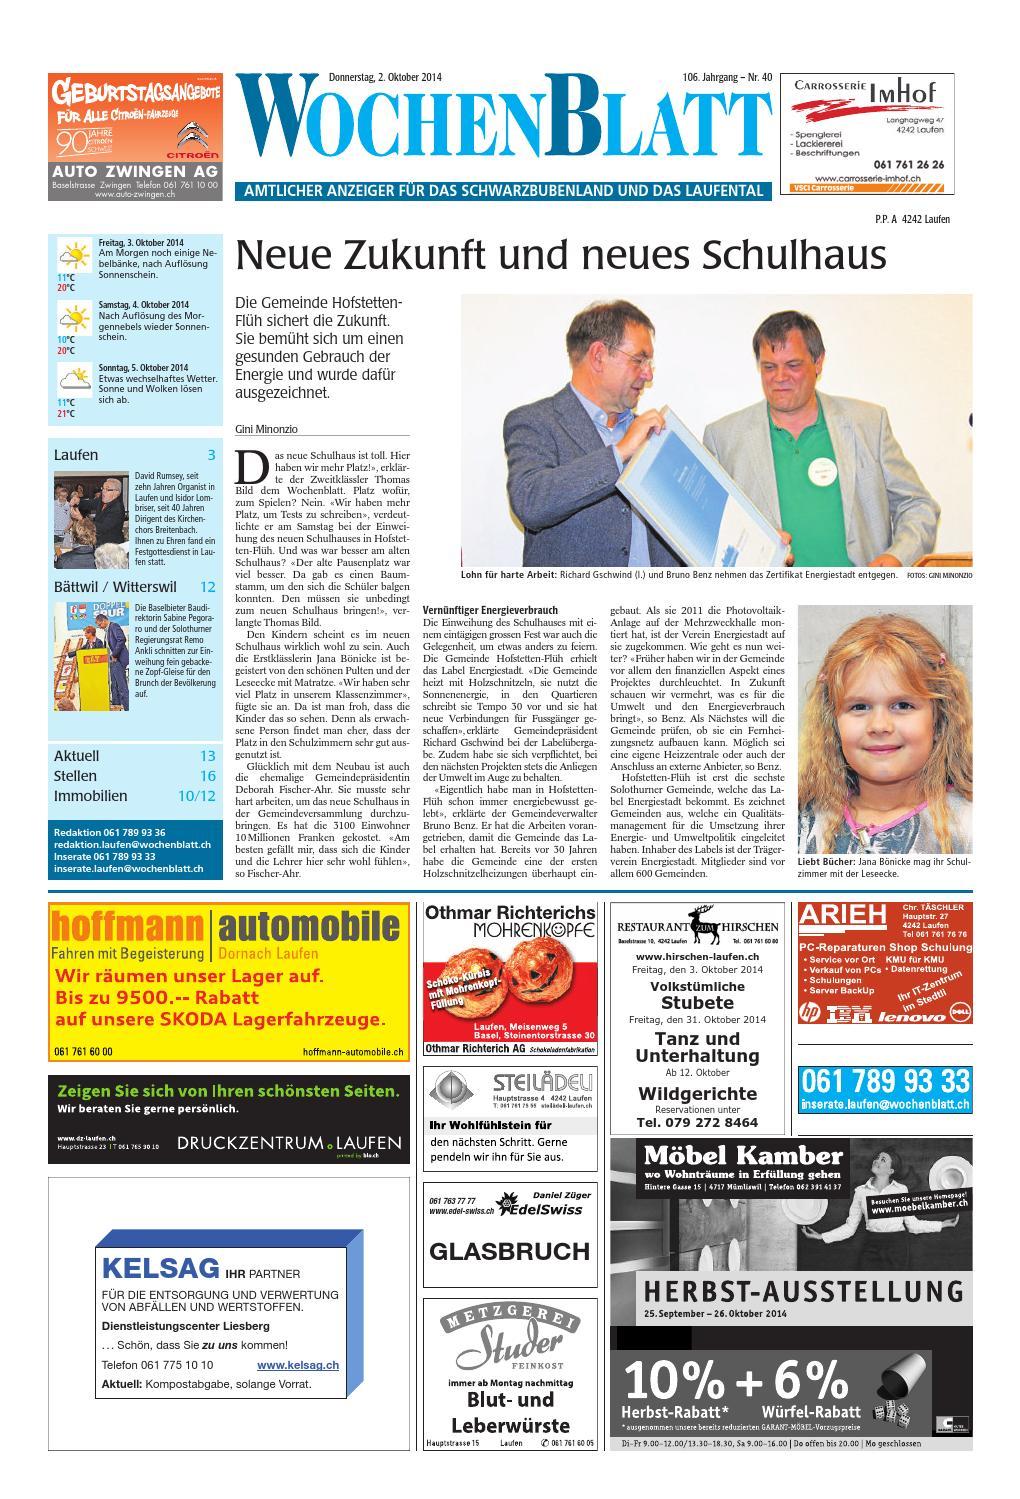 Persnliche Partnervermittlung In Therwil Berne Singlespeed Single